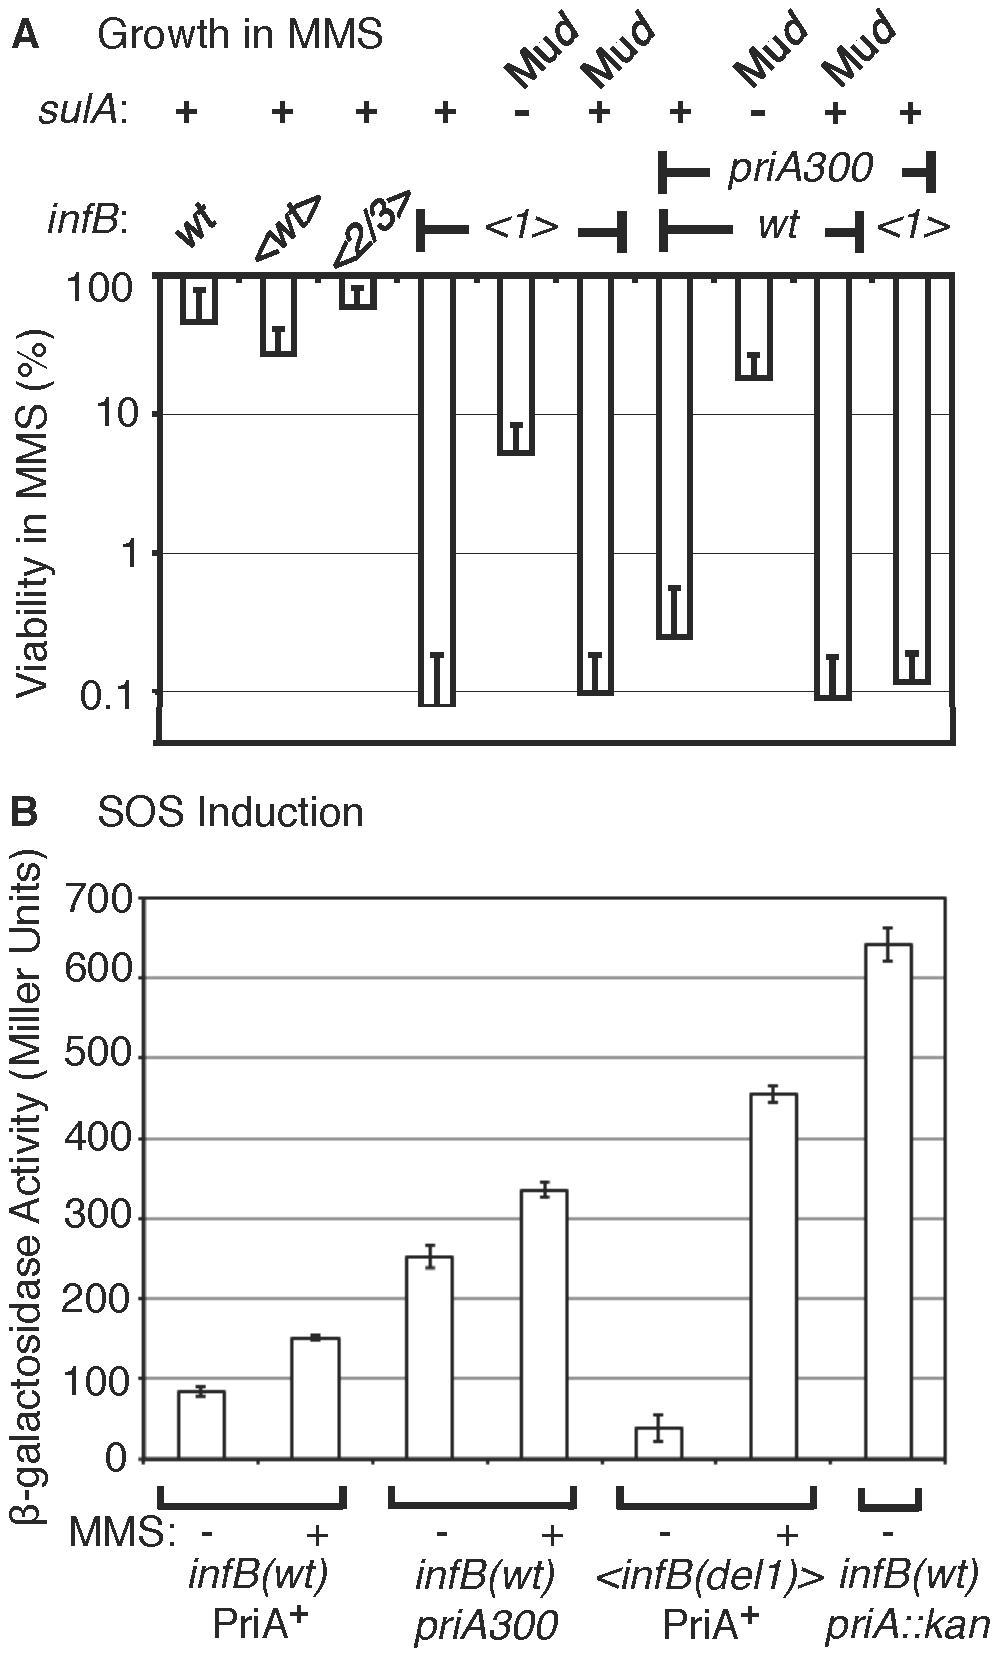 Characteristics of MMS sensitivity exhibited by <i>&lt;infB(del1)&gt;</i> mutants and similarity to <i>priA300</i>.